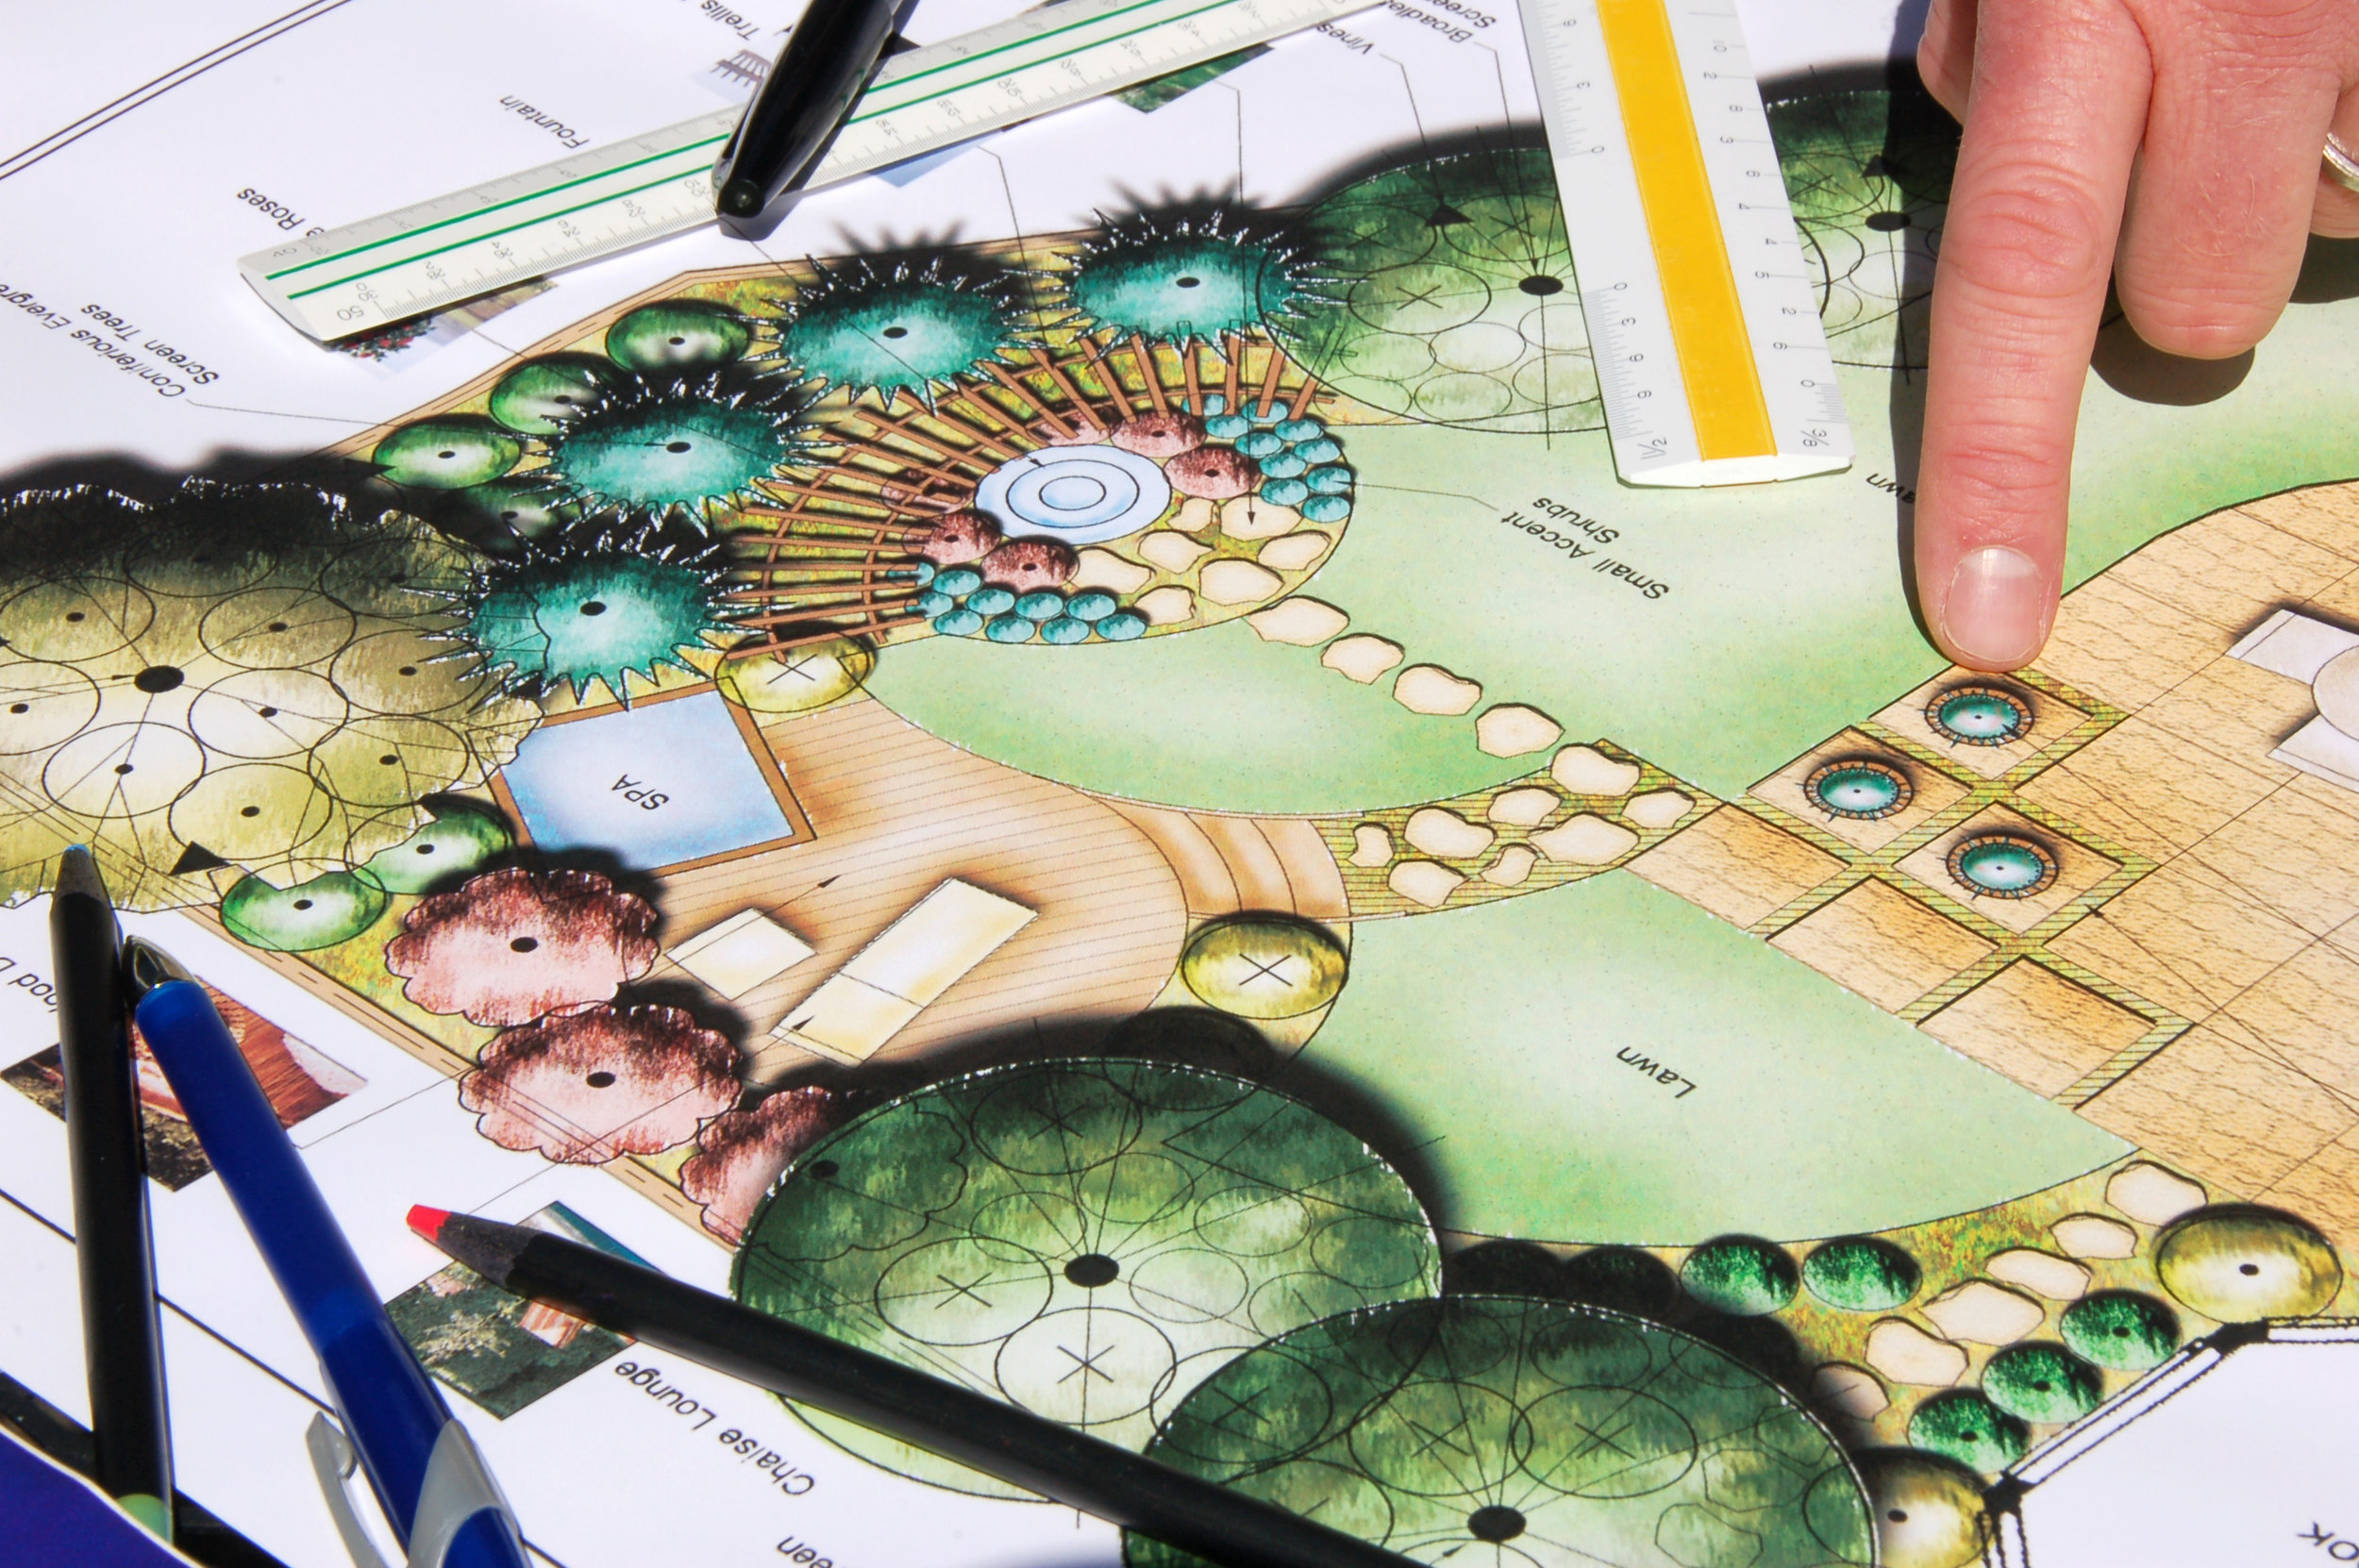 Garden Design - Design, Build, Instal.